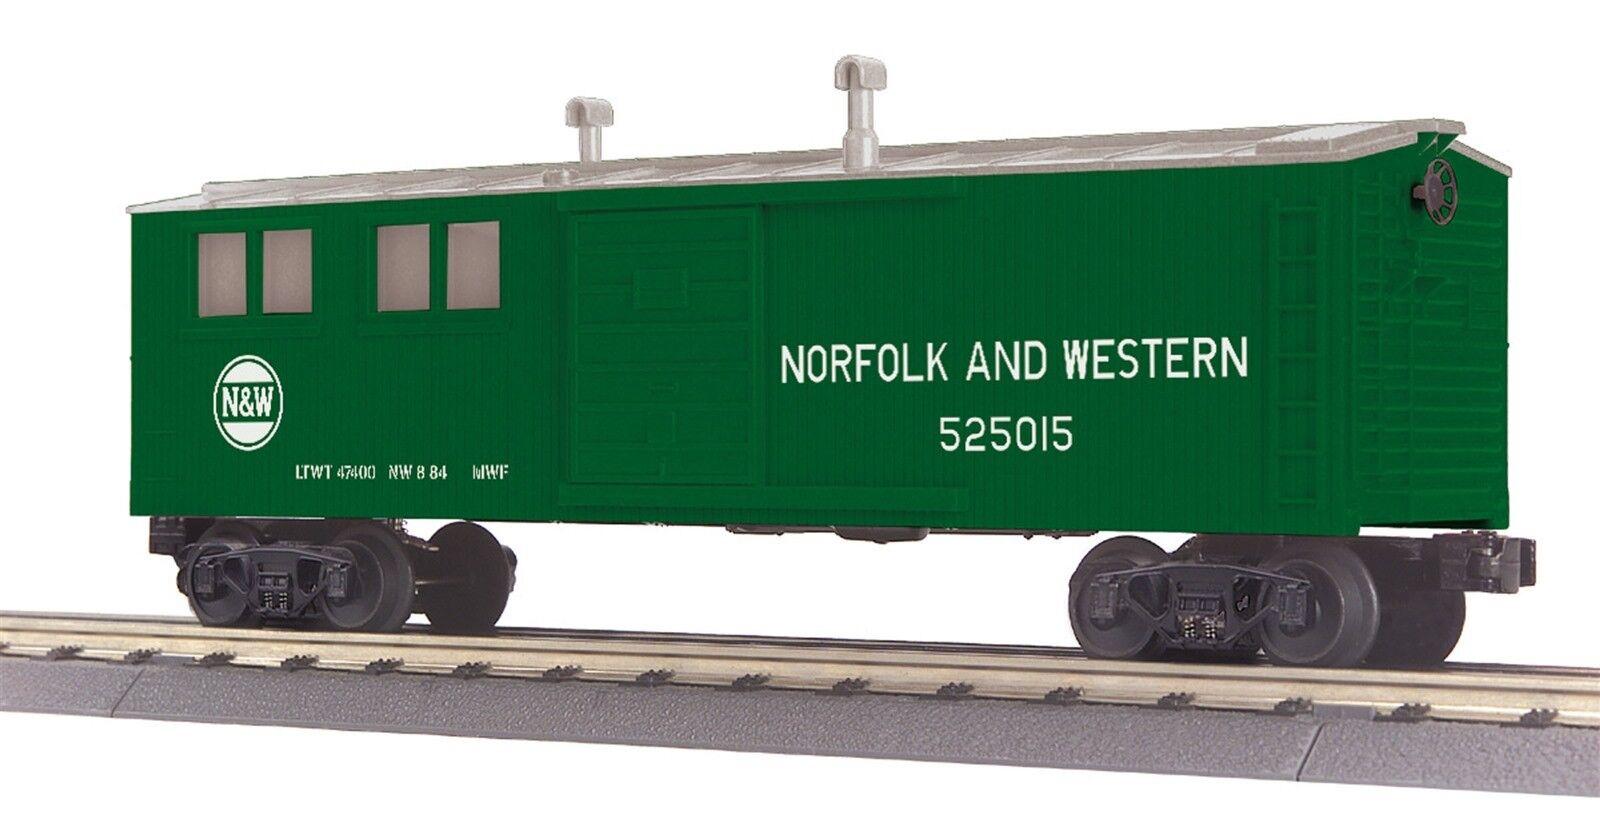 MTH RailKing 30-79477 Norfolk And Western Engineering Car O Gauge Model Trains